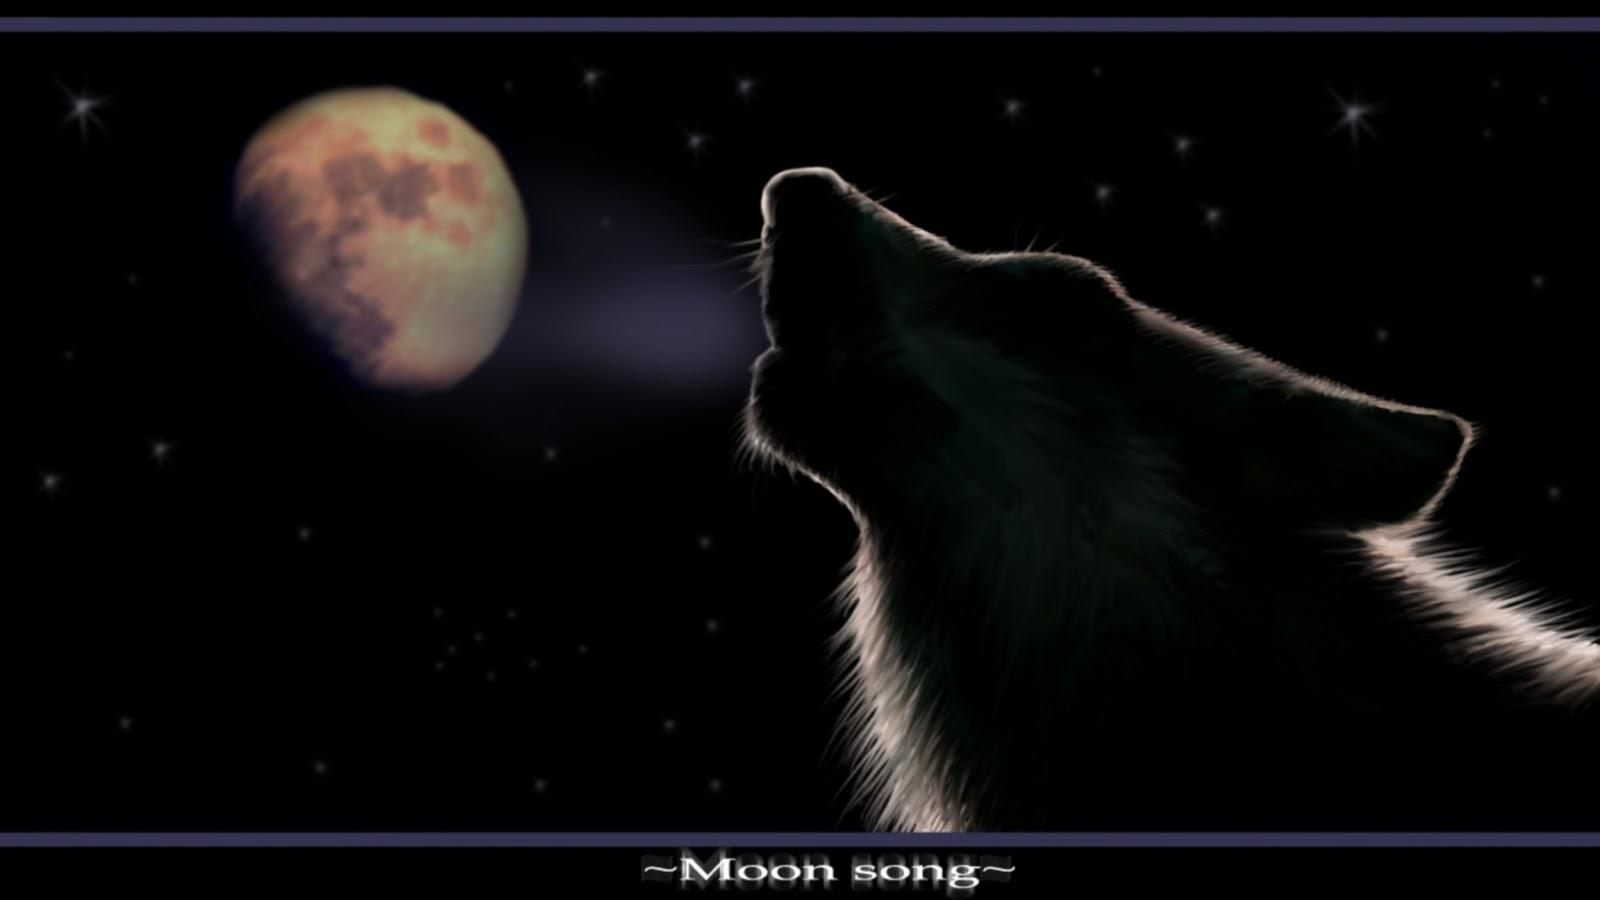 http://2.bp.blogspot.com/-6M1yCZOiVPg/TpVc8F56jII/AAAAAAAADBM/t7JTaAO19cM/s1600/fox-wallpaper.jpg